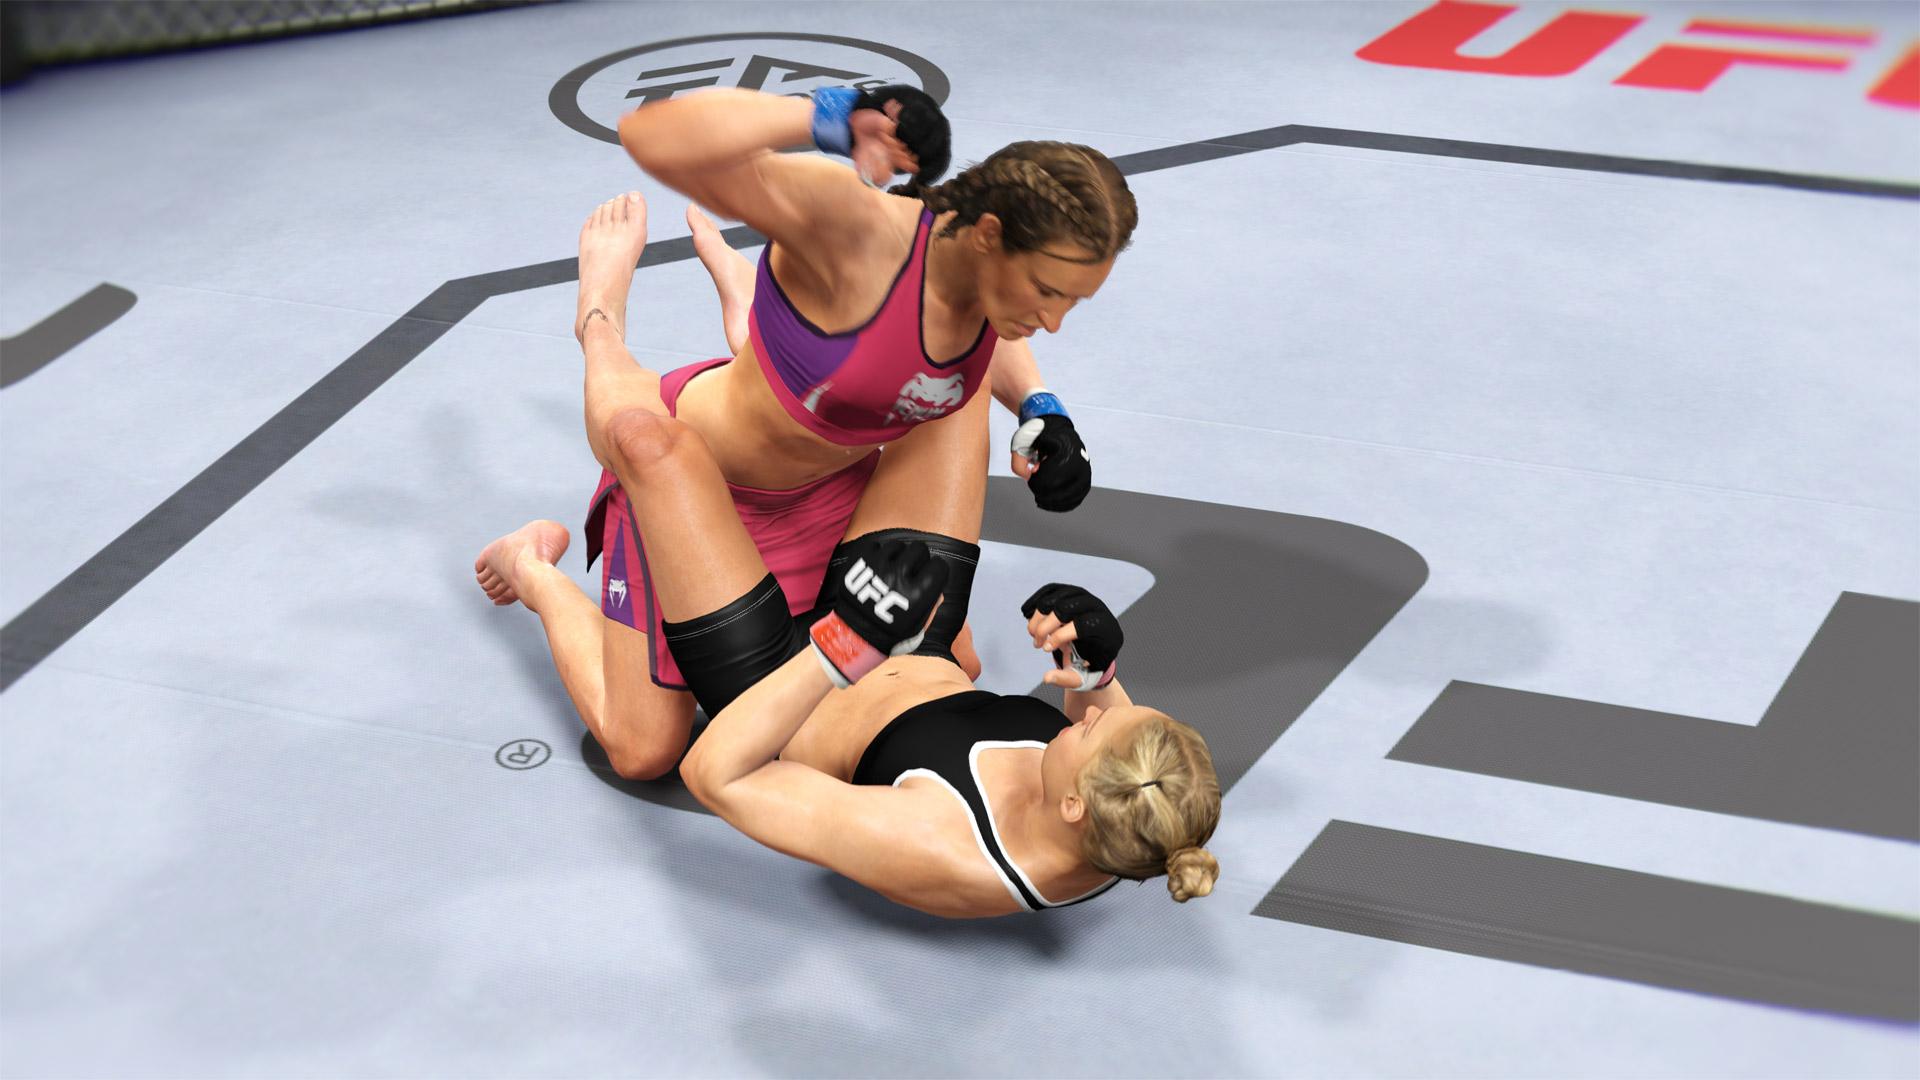 f1775e9a399dc2fc096b4deb30bb6251cffc8ae9-832248.jpg - EA Sports UFC